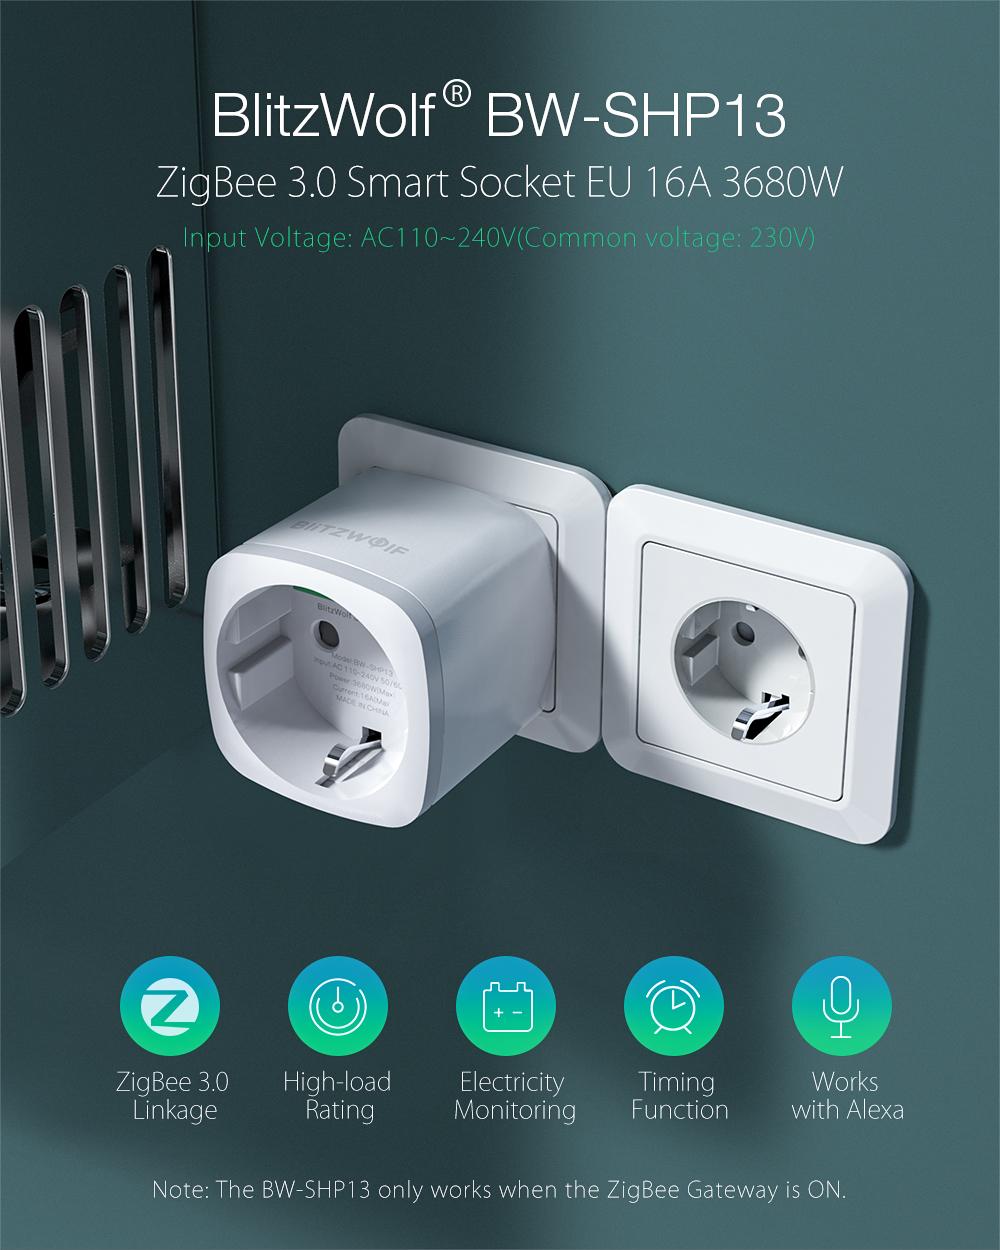 Blitzwolf BW-SHP13 smart socket